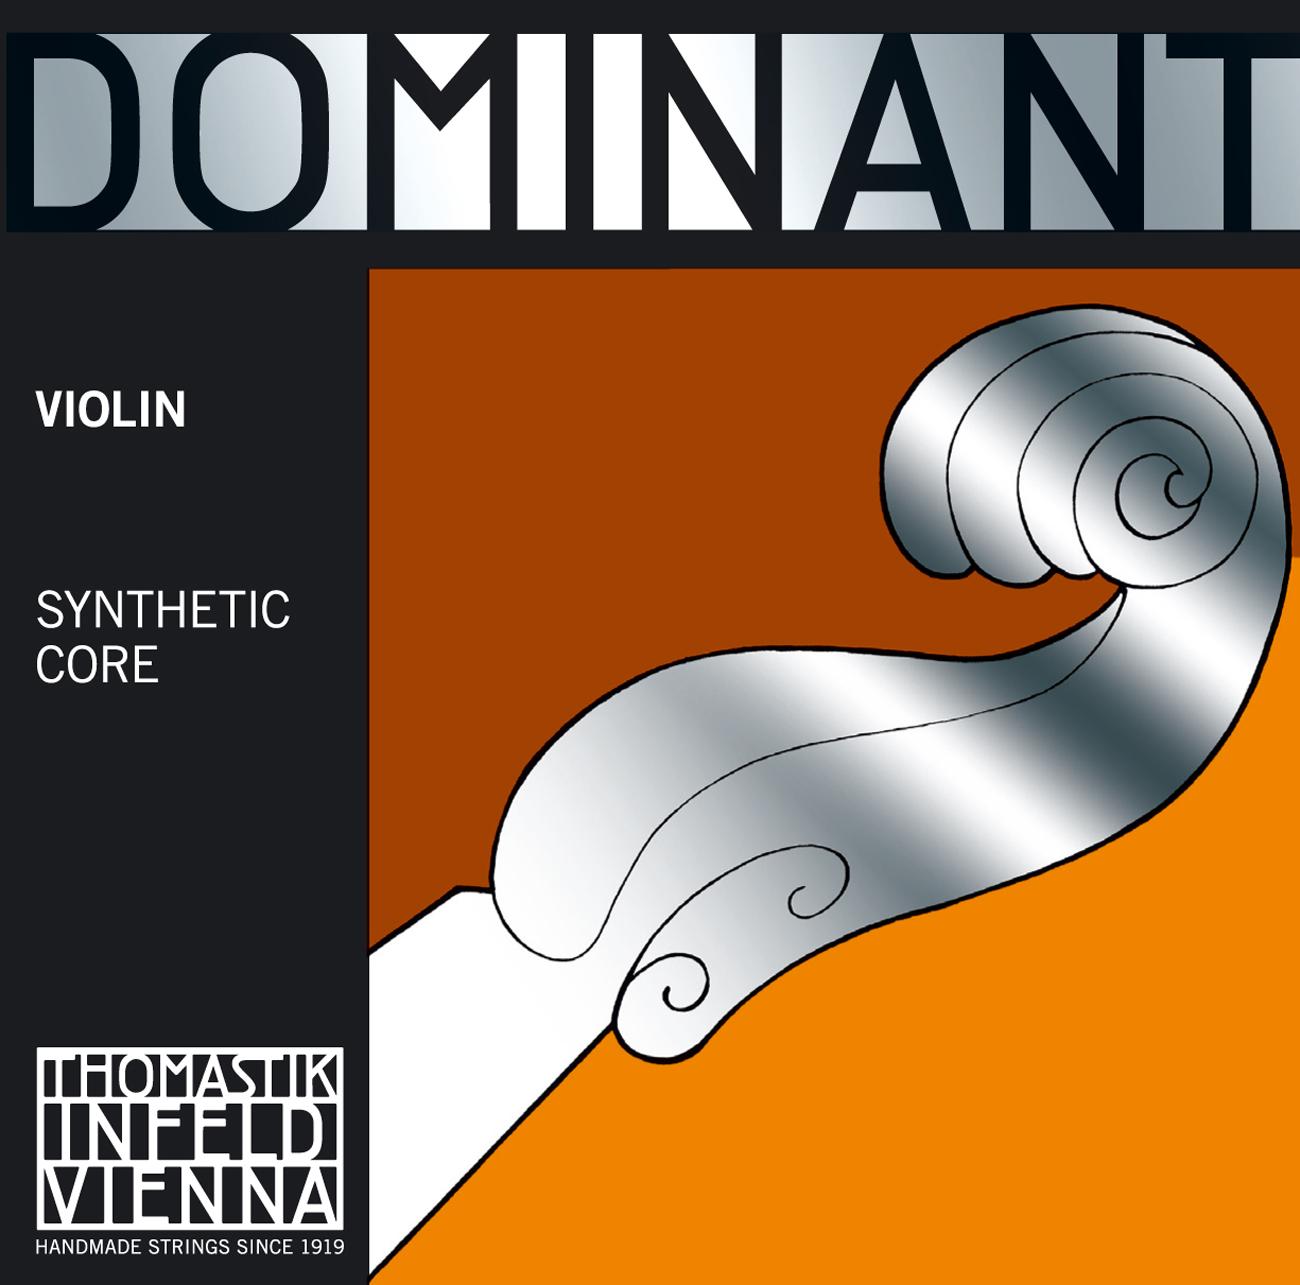 Dominant Violin E Aluminium ball 4/4 - Strong